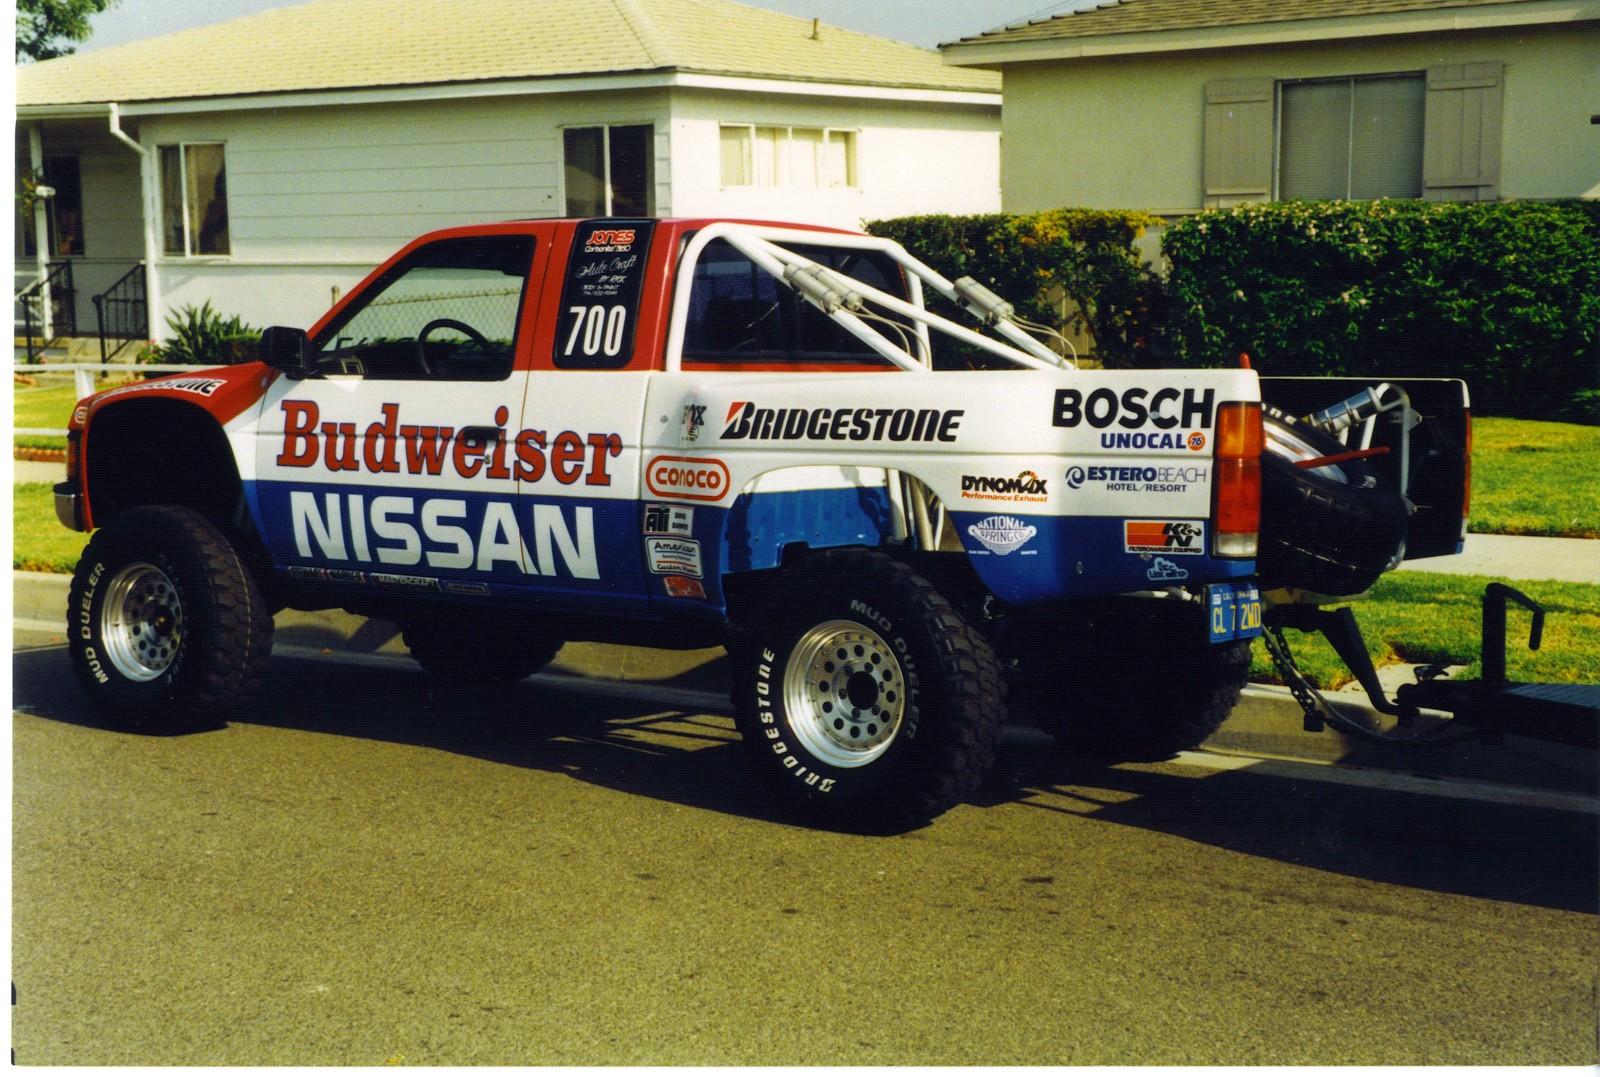 1995 Nissan Pick Up Trailer Wiring Harness Trusted Diagram 95 Hardbody Pickup Engine Compatibility Titan Forum